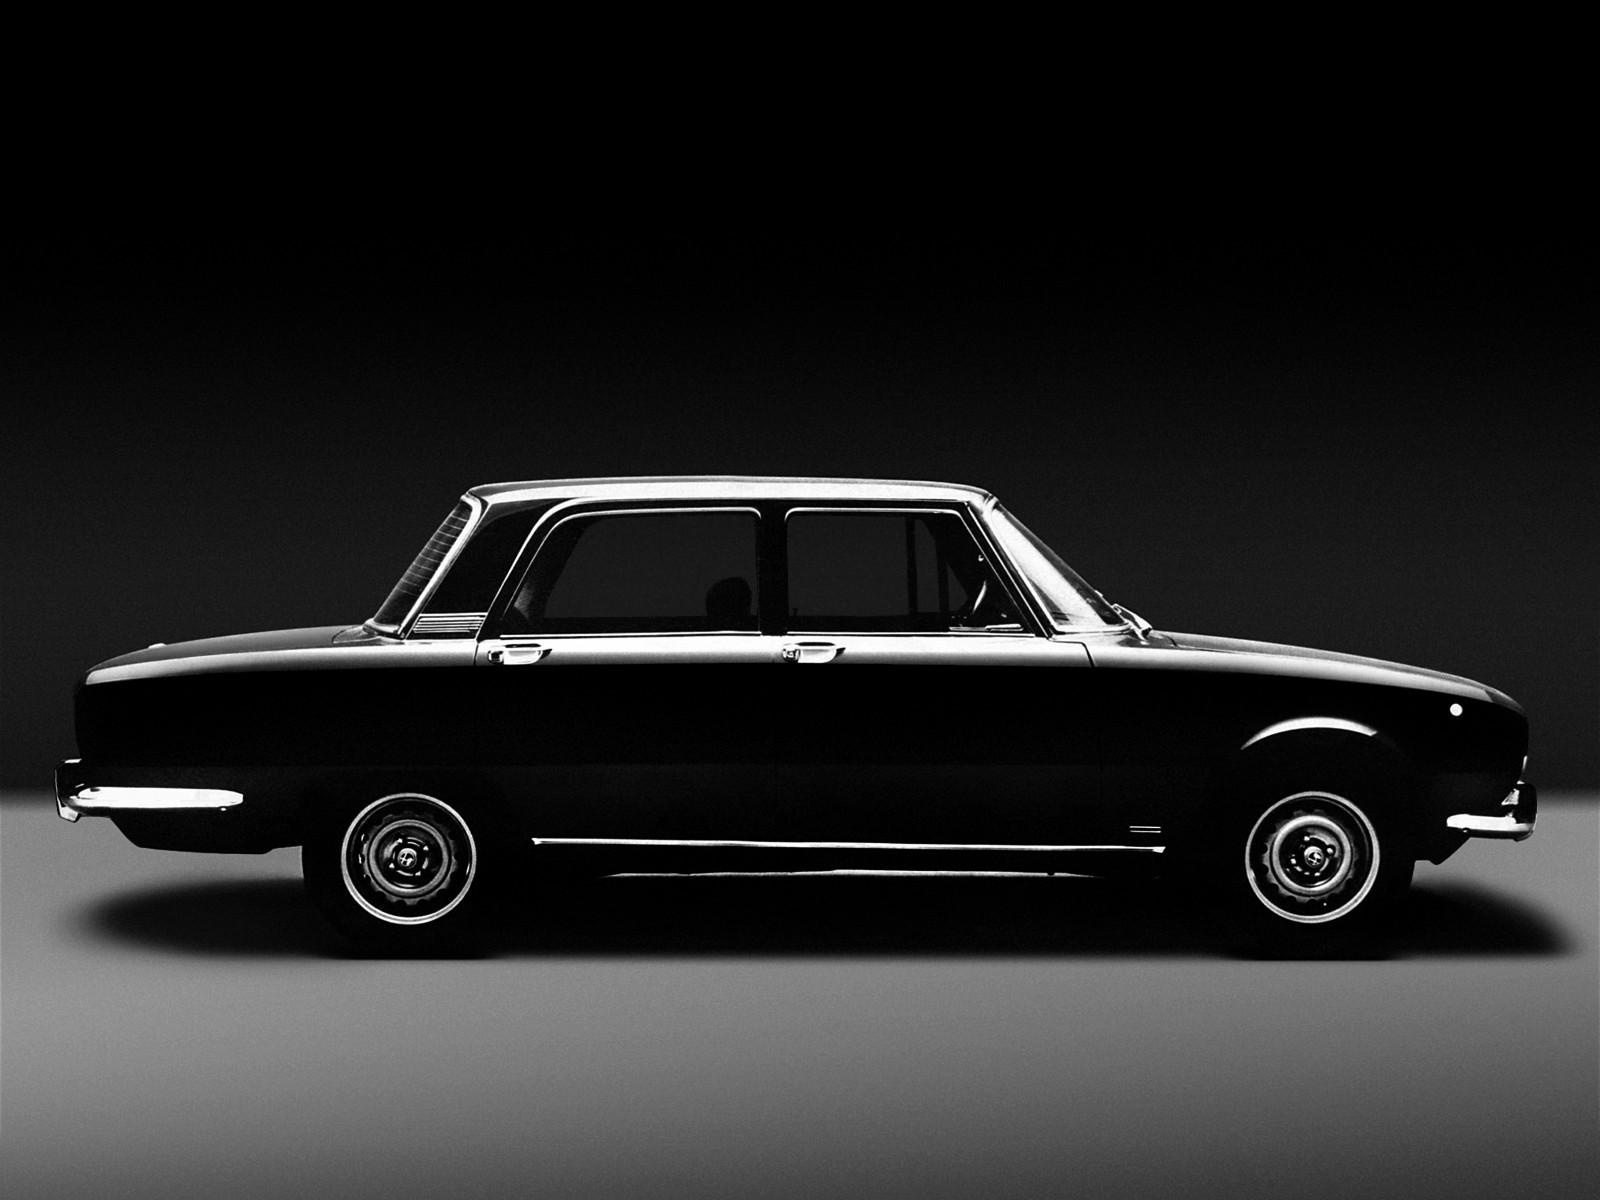 alfa romeo 2000 berlina specs - 1971, 1972, 1973, 1974, 1975, 1976